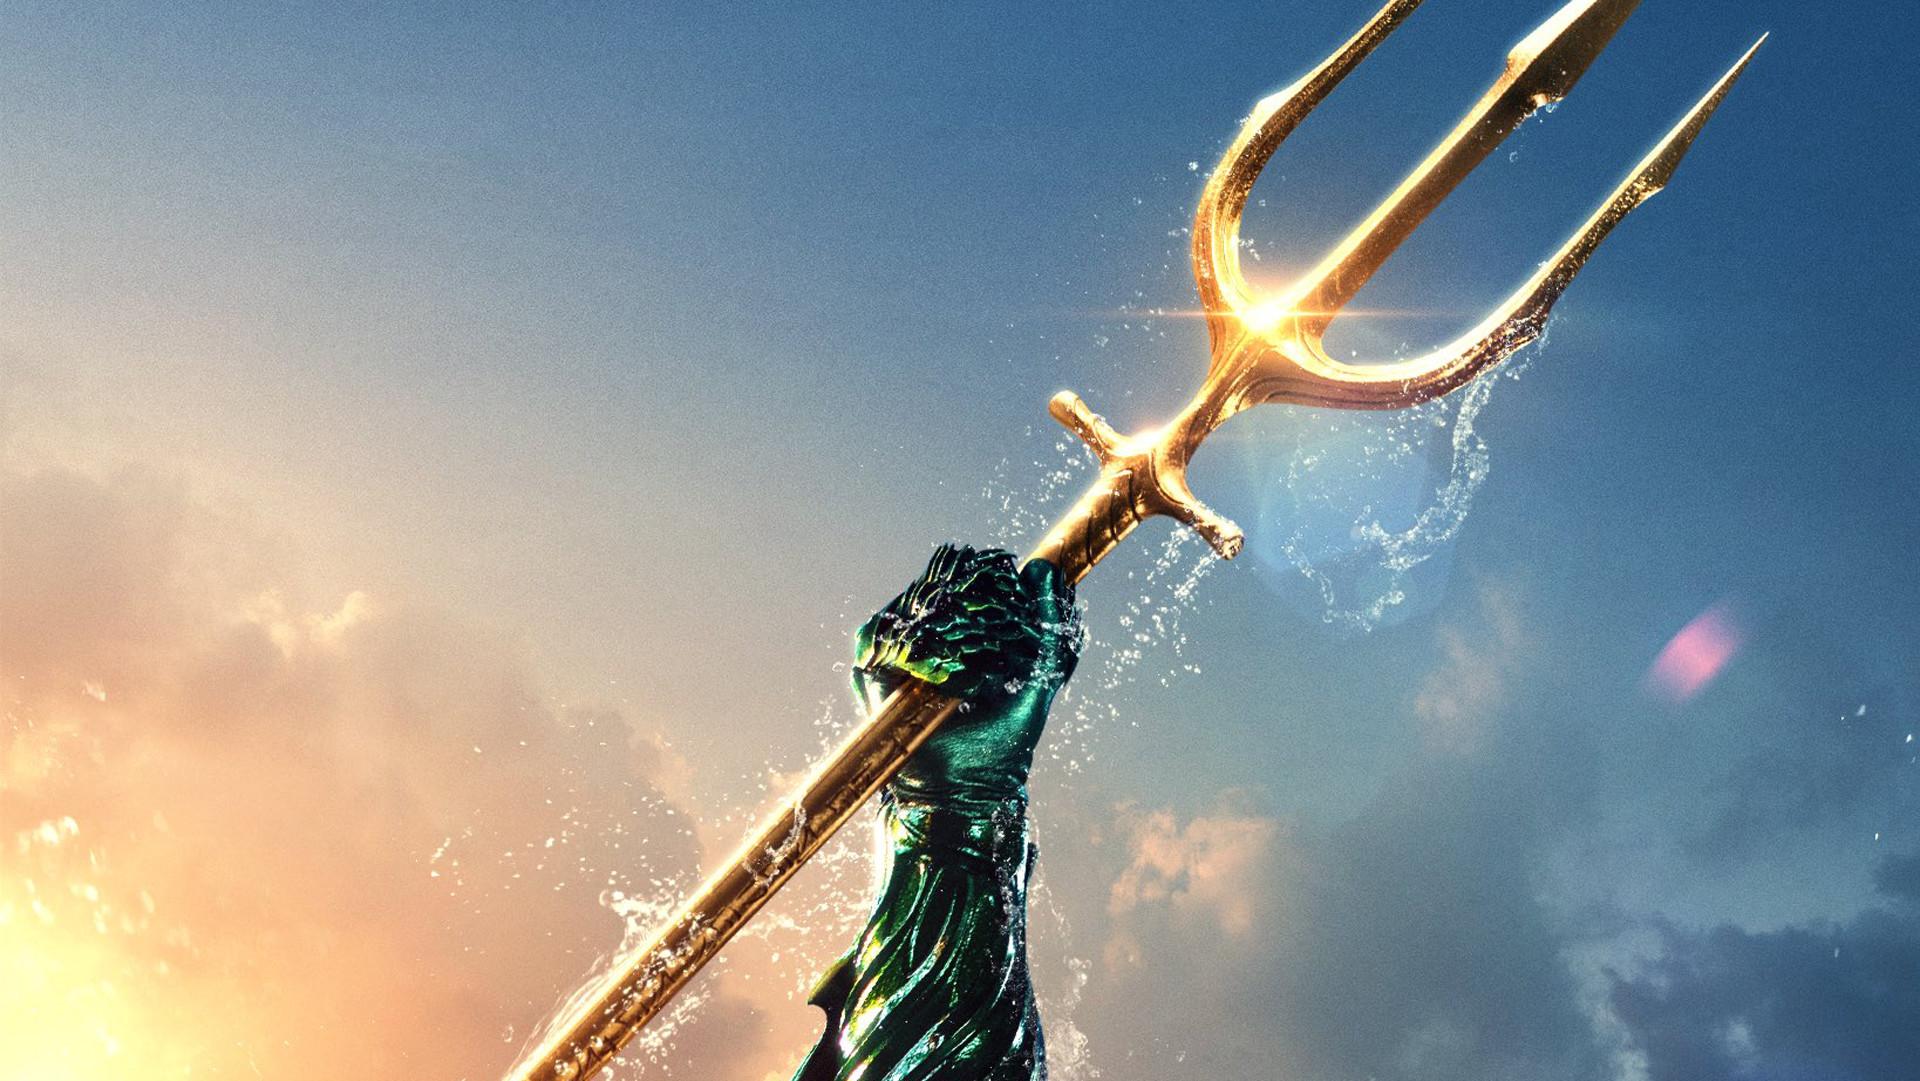 Res: 1920x1081, Aquaman HD Wallpaper | Hintergrund |  | ID:953258 - Wallpaper Abyss